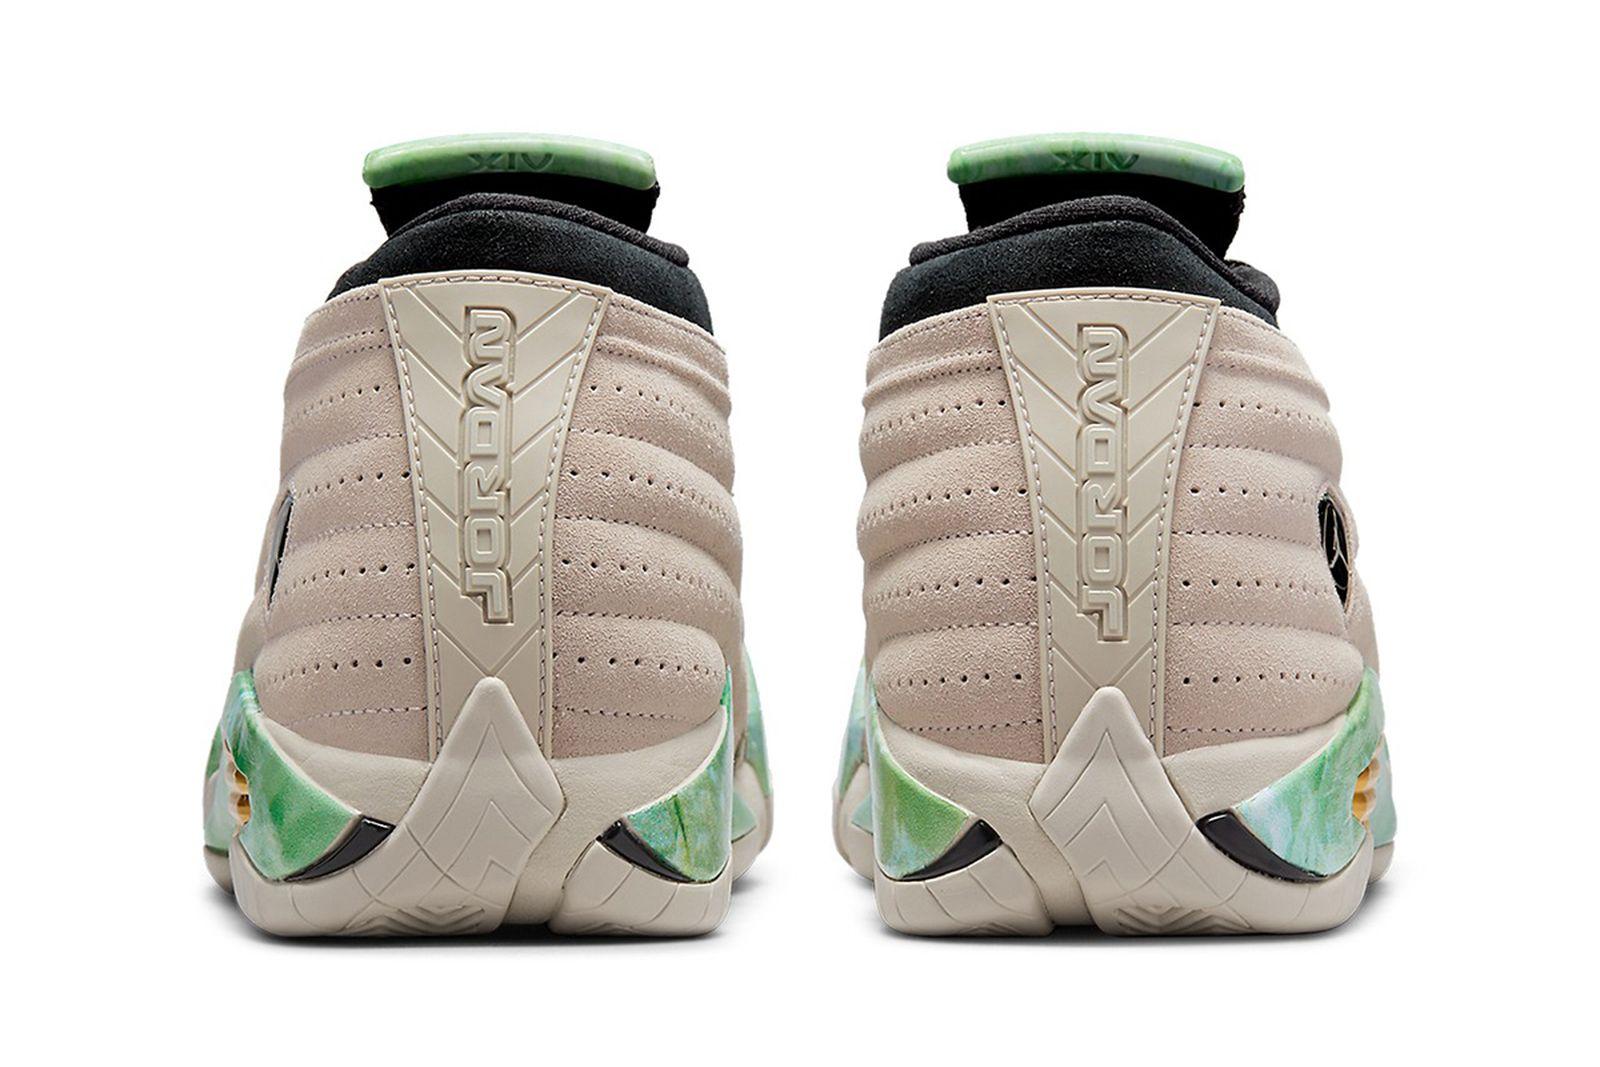 Aleali May x Nike Air Jordan 14 Low: Official Images & Drop Info